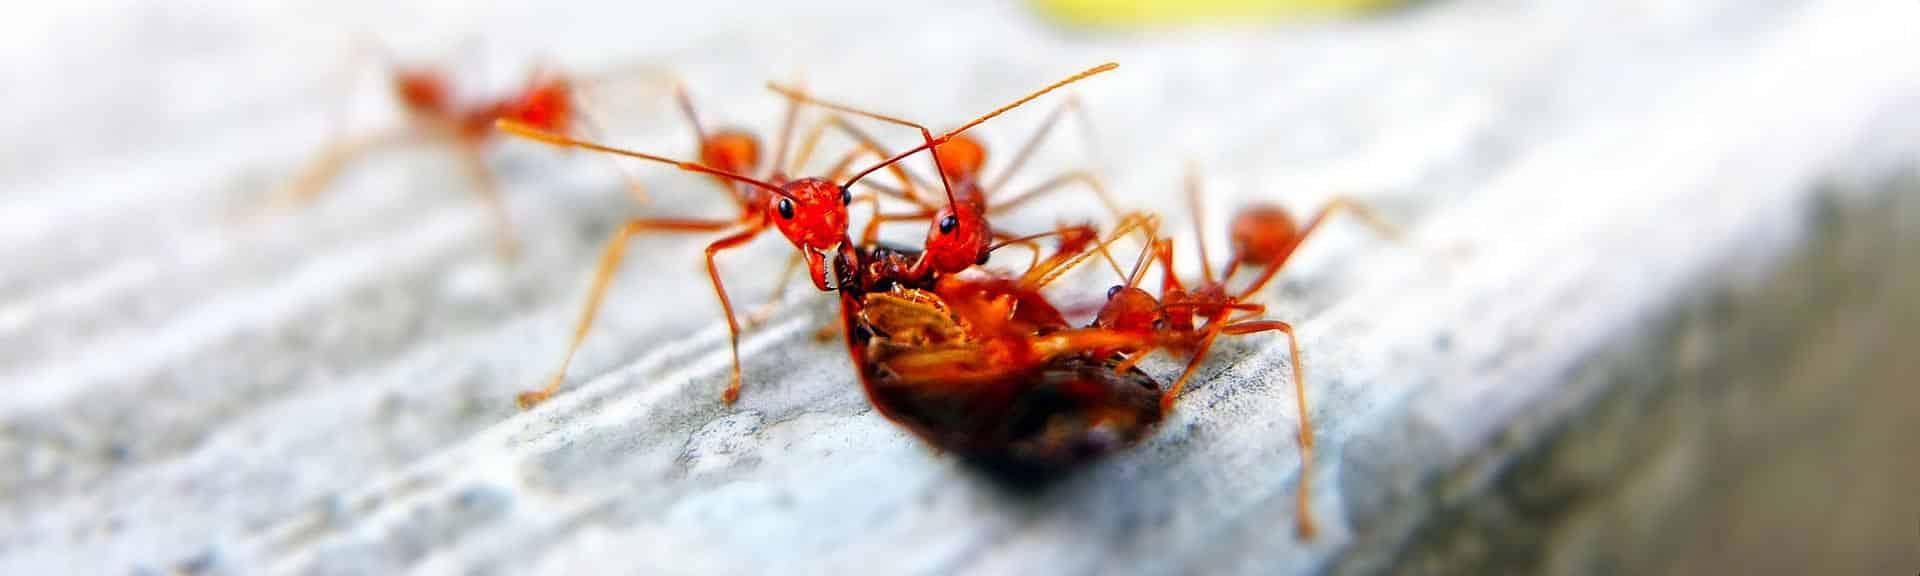 fourmis algos 3D pest control